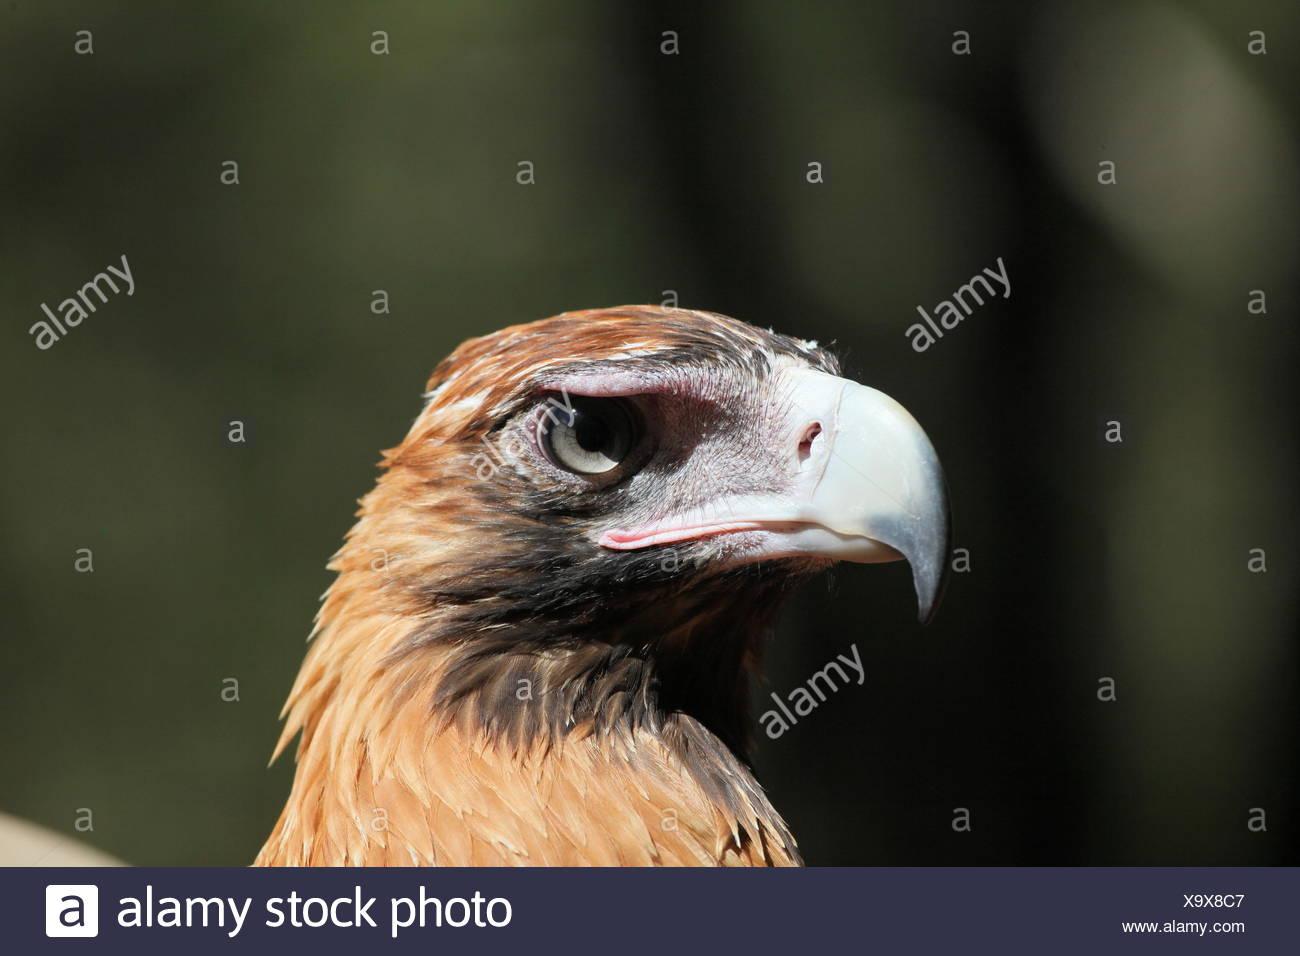 wedge, eagle, berry, portrait, keilschwanzadler, tailed, australien, Stock Photo